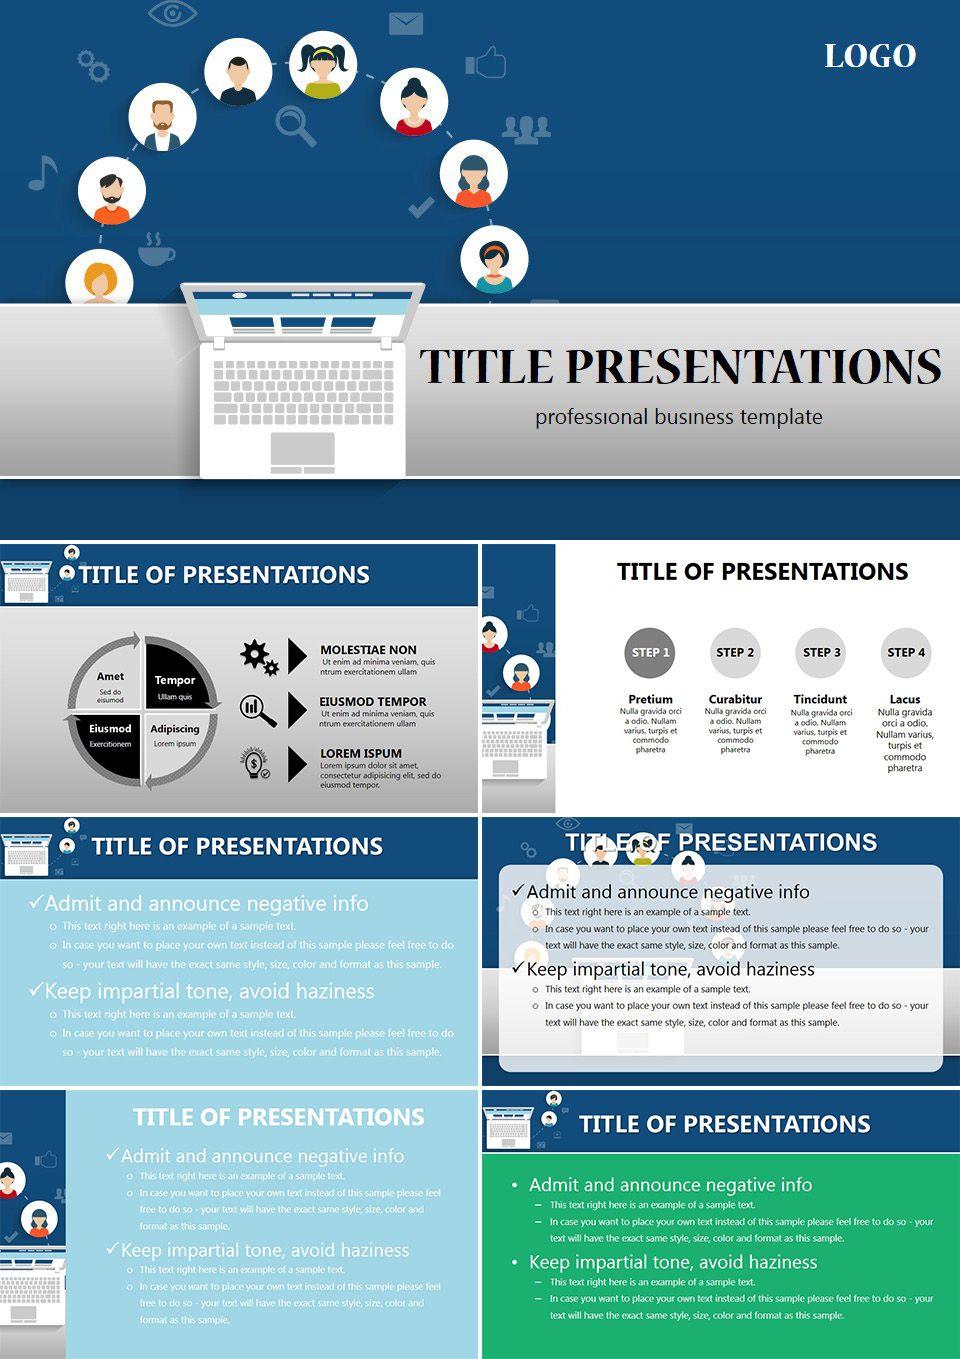 social media analytics powerpoint templates | powerpoint templates, Presentation templates